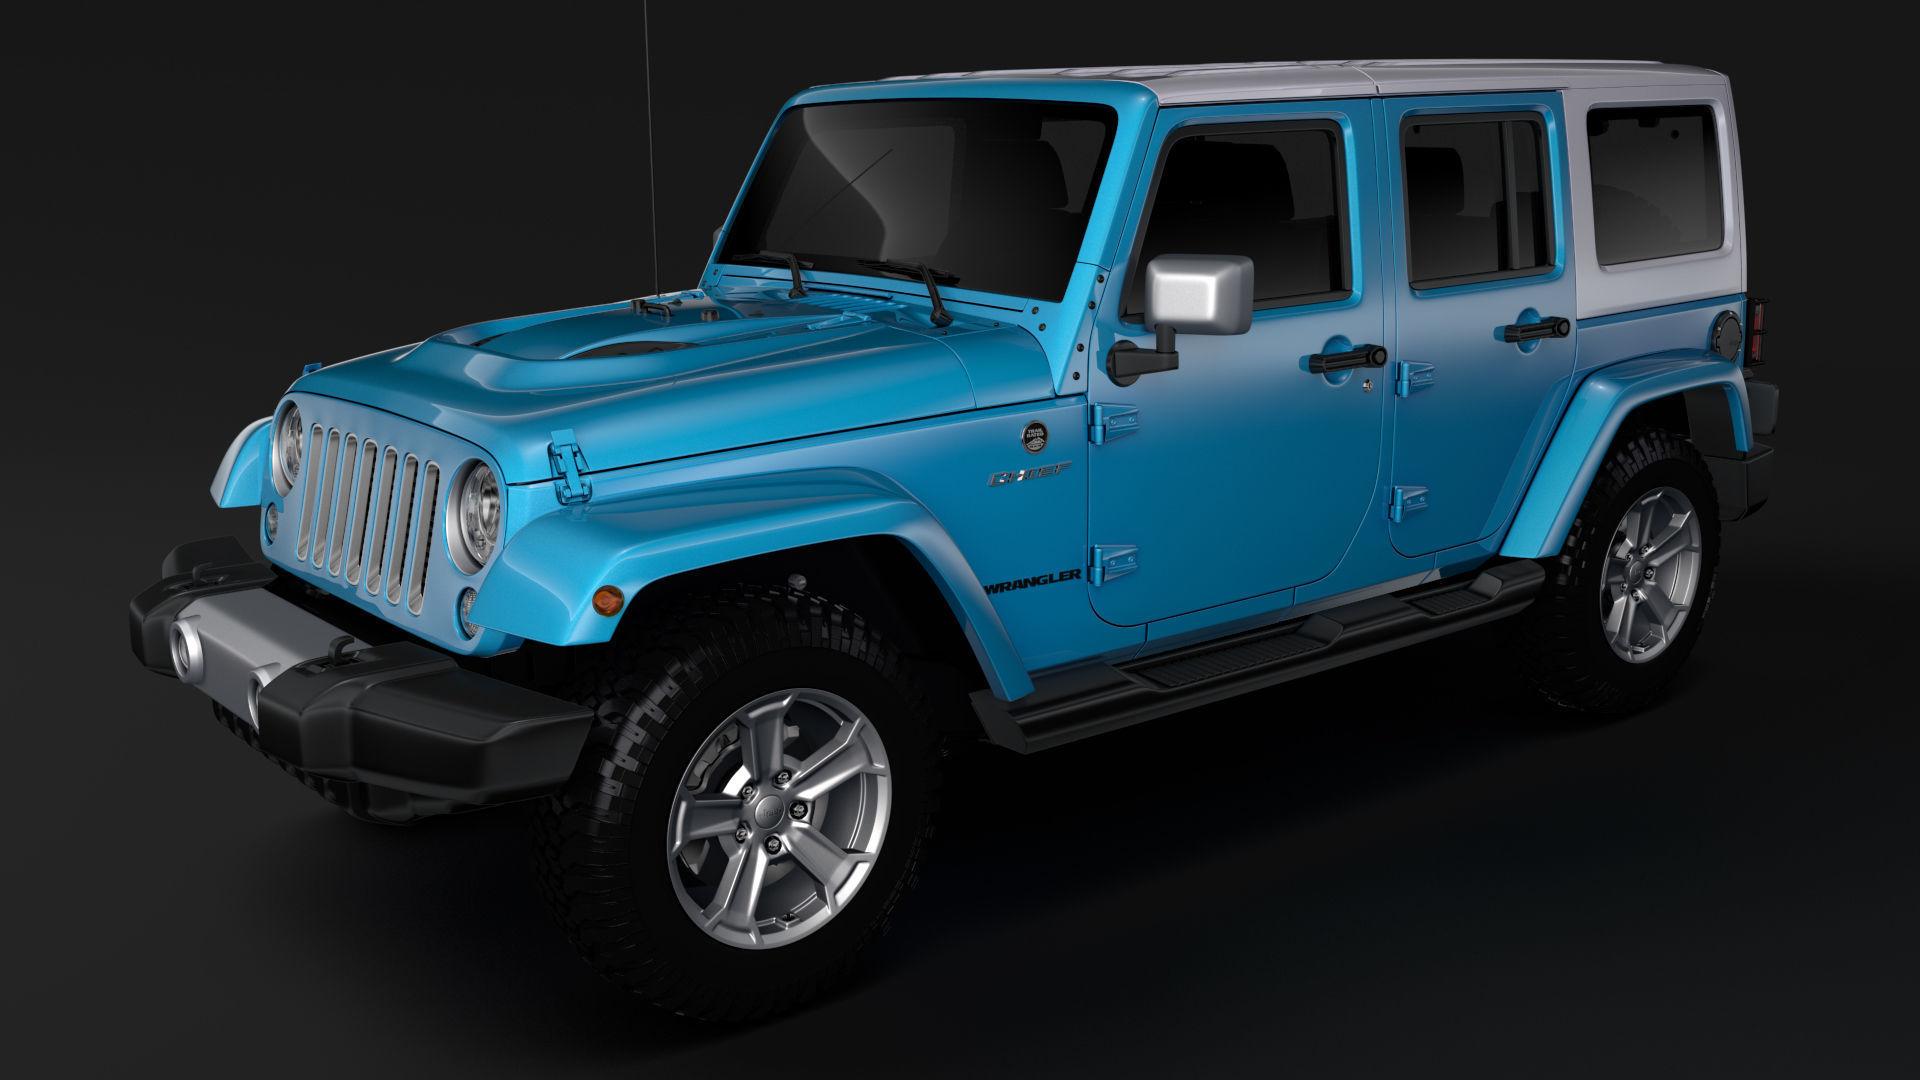 Jeep Wrangler Unlimited Chief Jk 2017 Model